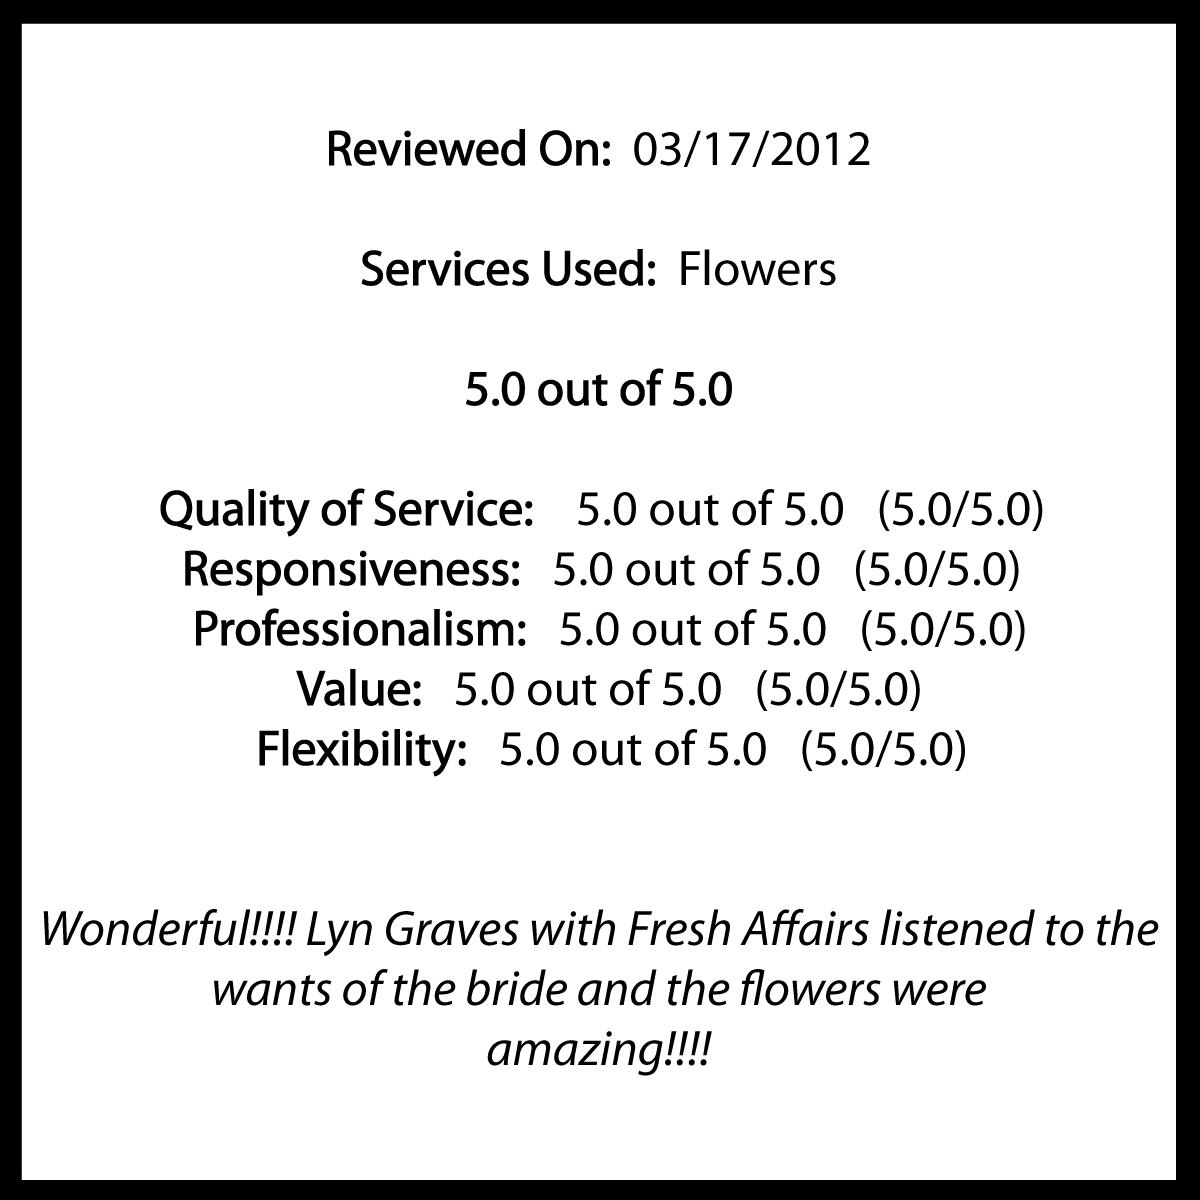 Fresh Affairs | WeddingWire Review